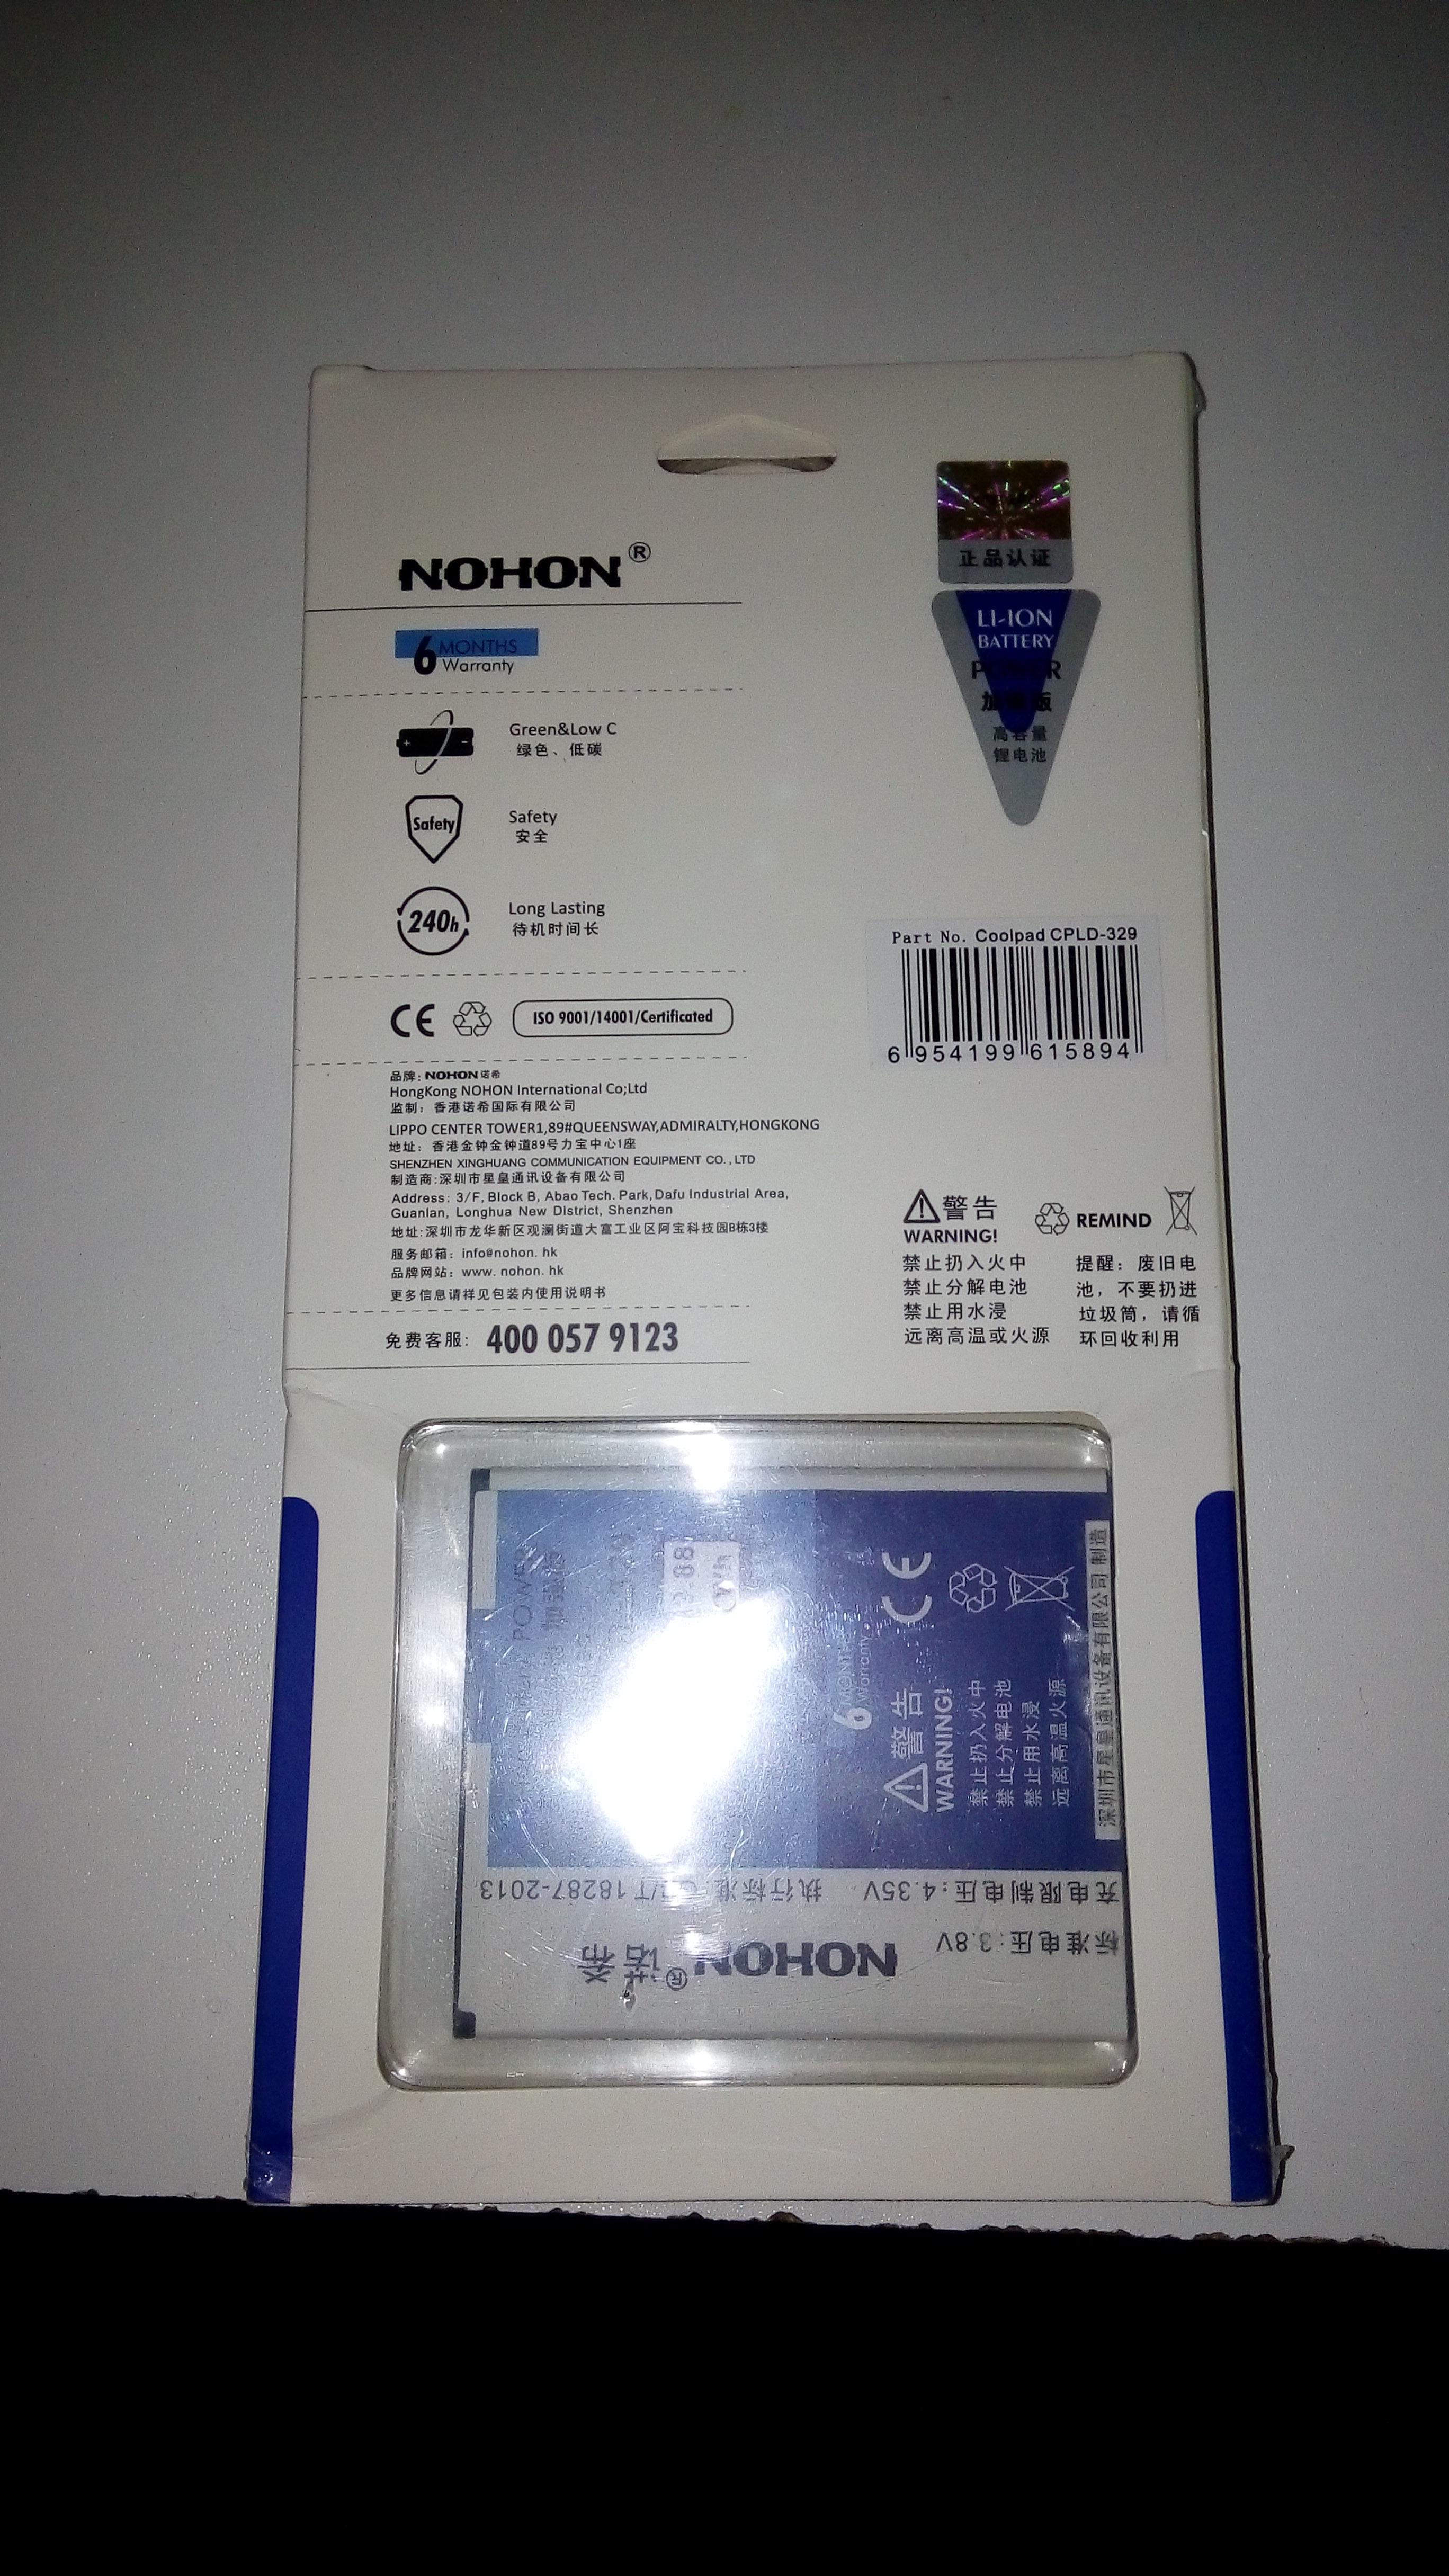 Coolpad F1 8297w - Review / Info / Software / Custom Roms